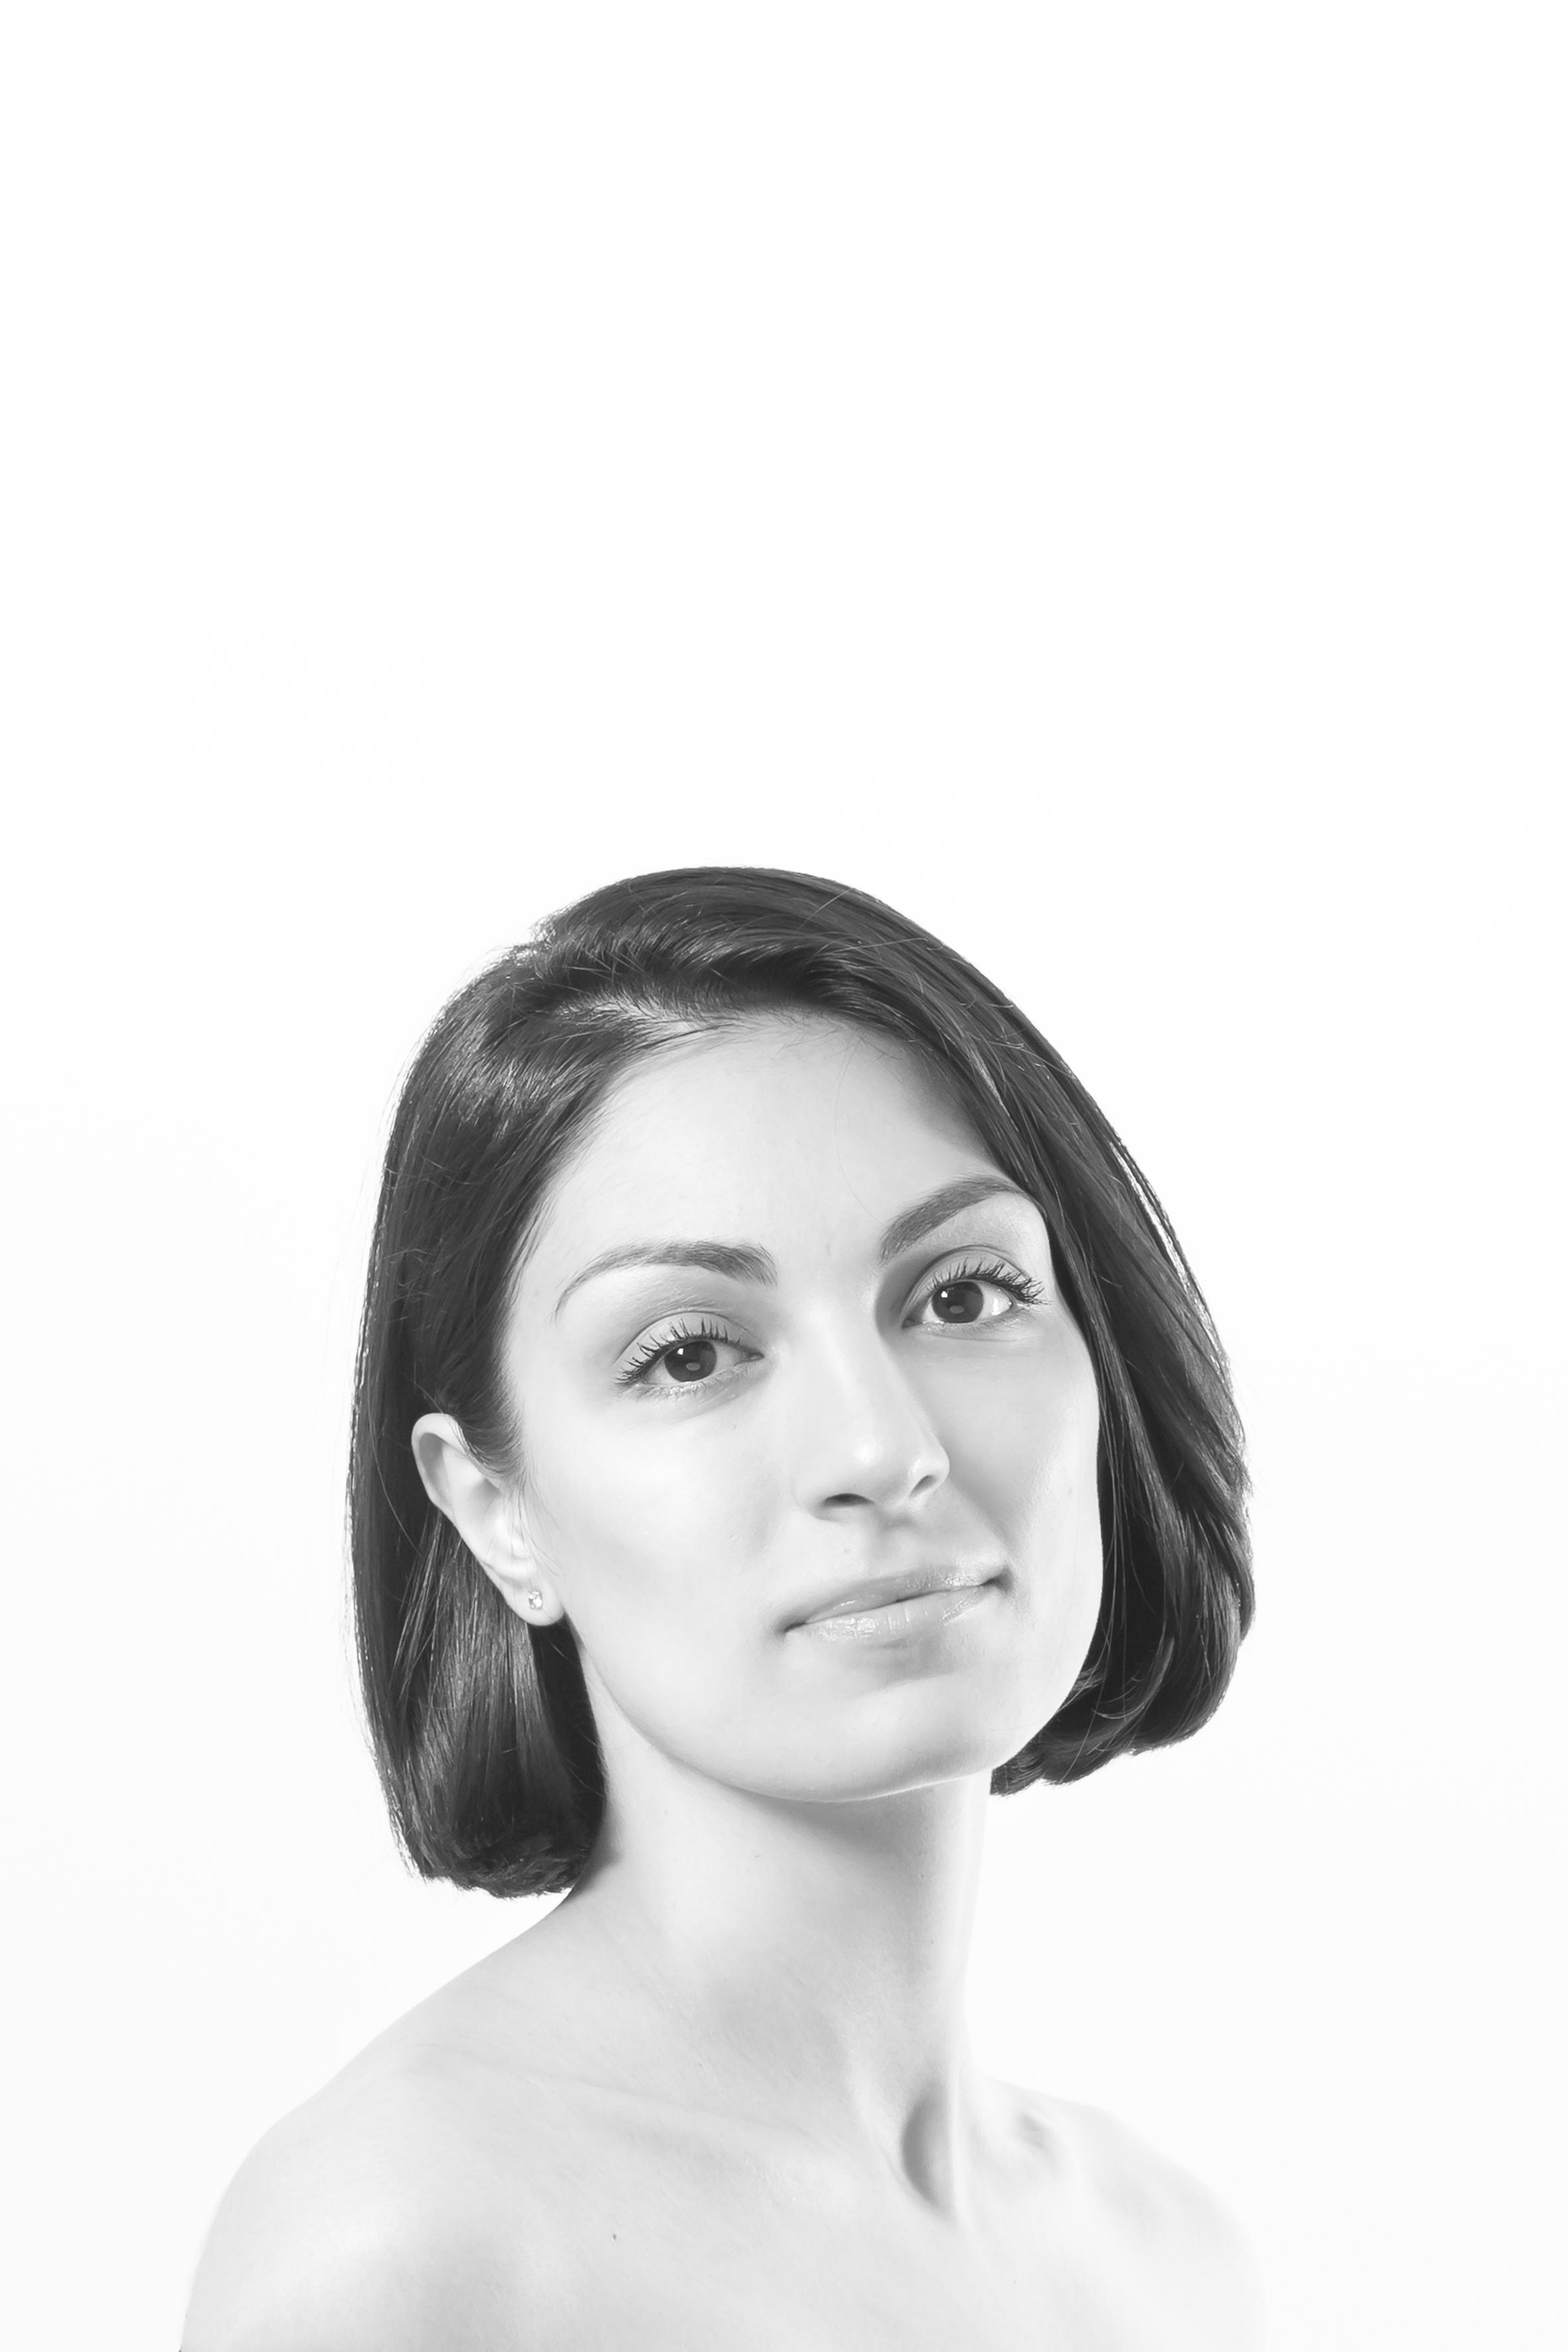 Marta Navasardyan